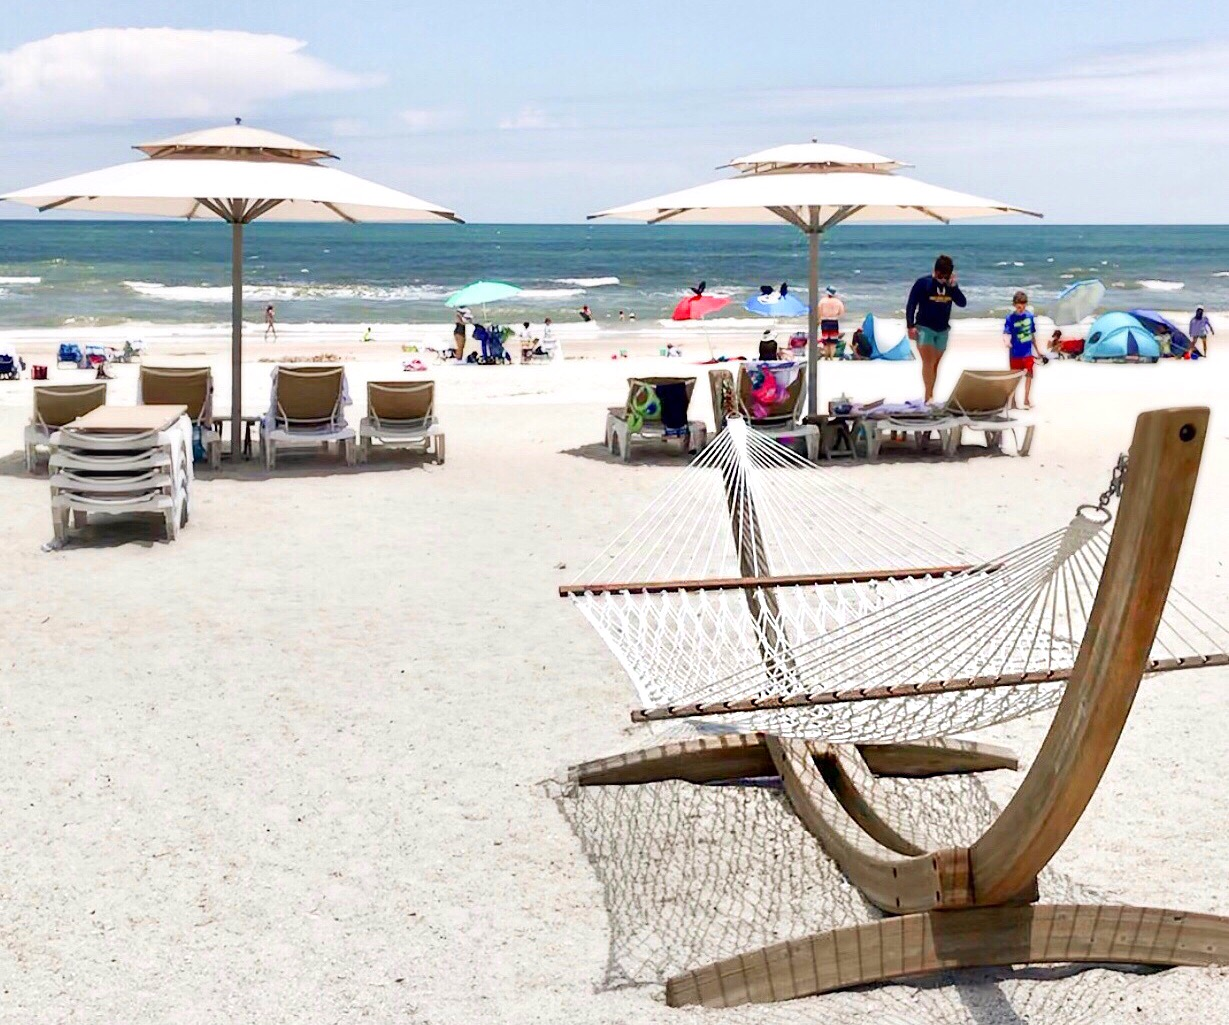 Omni Amelia plantation resort, Fernandina Beach Florida, Amelia Island, 7 Reasons To Visit Amelia Island With Your Family